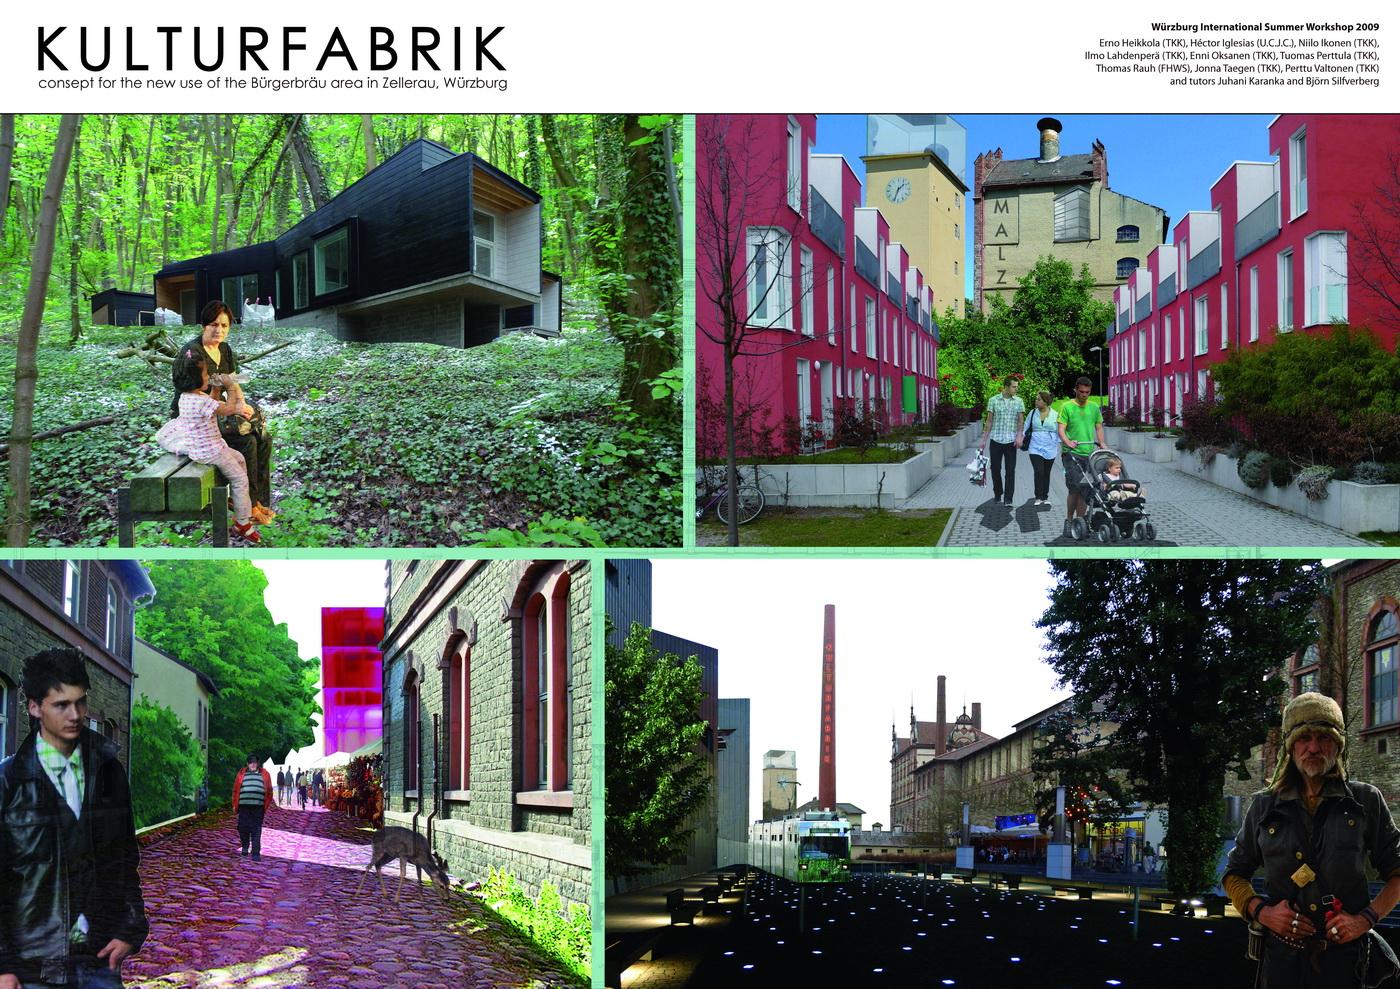 kulturfabrik_6